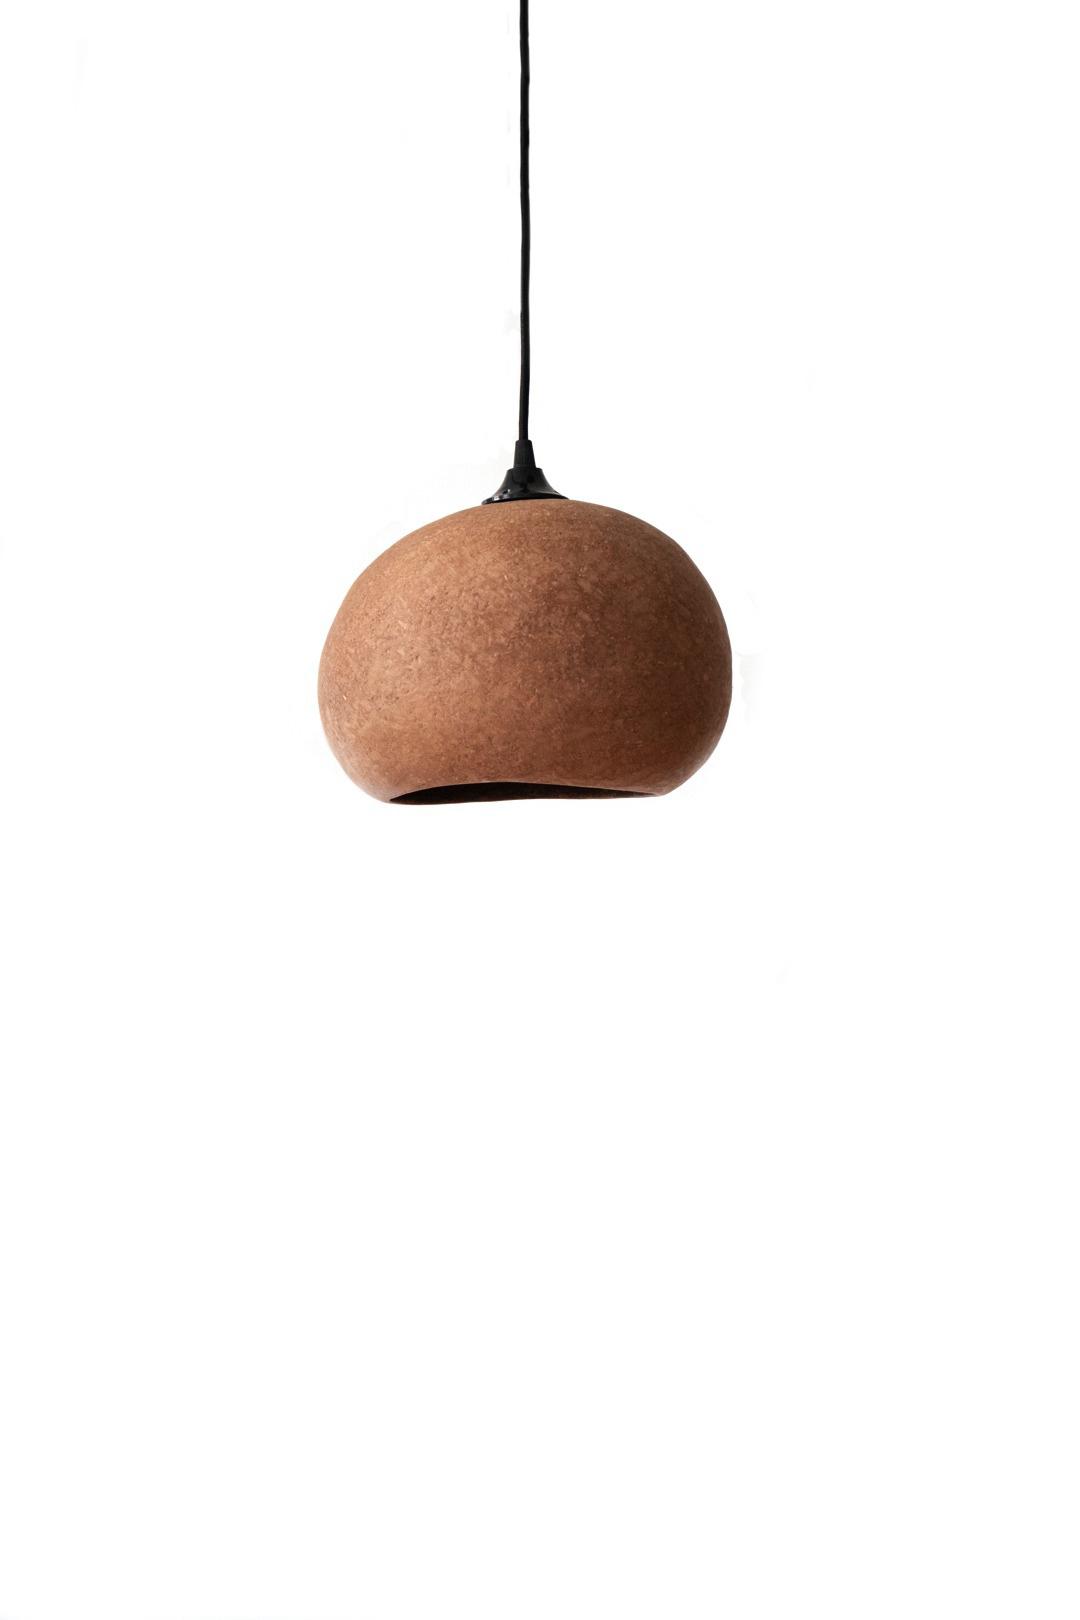 Ay Illuminate Lampe Suspension en Terracotta S - carton recyclé - 27x21x17cm - Ay illuminate